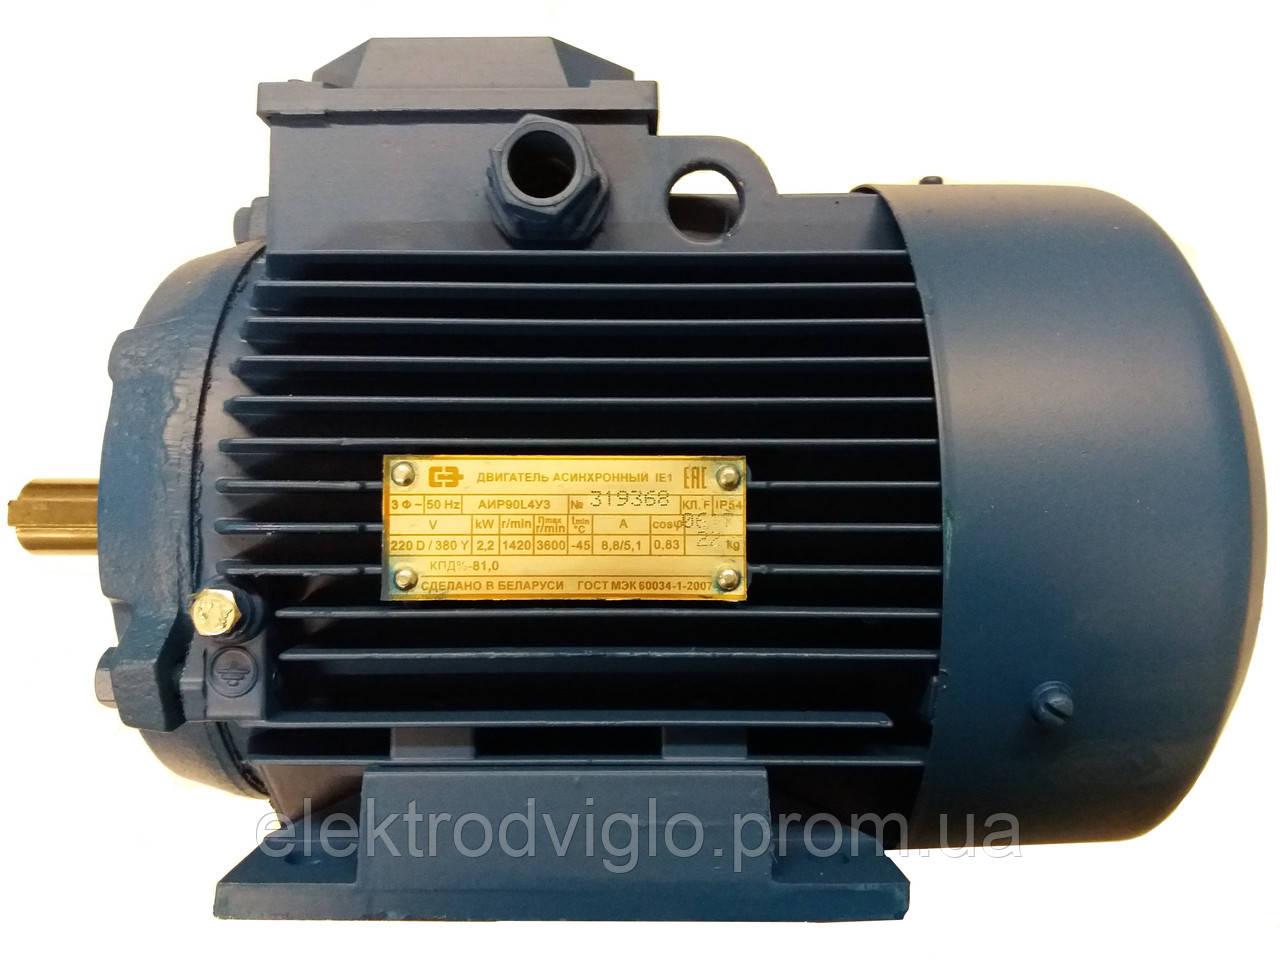 Электродвигатель АИР 90L8/4 0,8/1,32кВт 750/1500об, фото 1